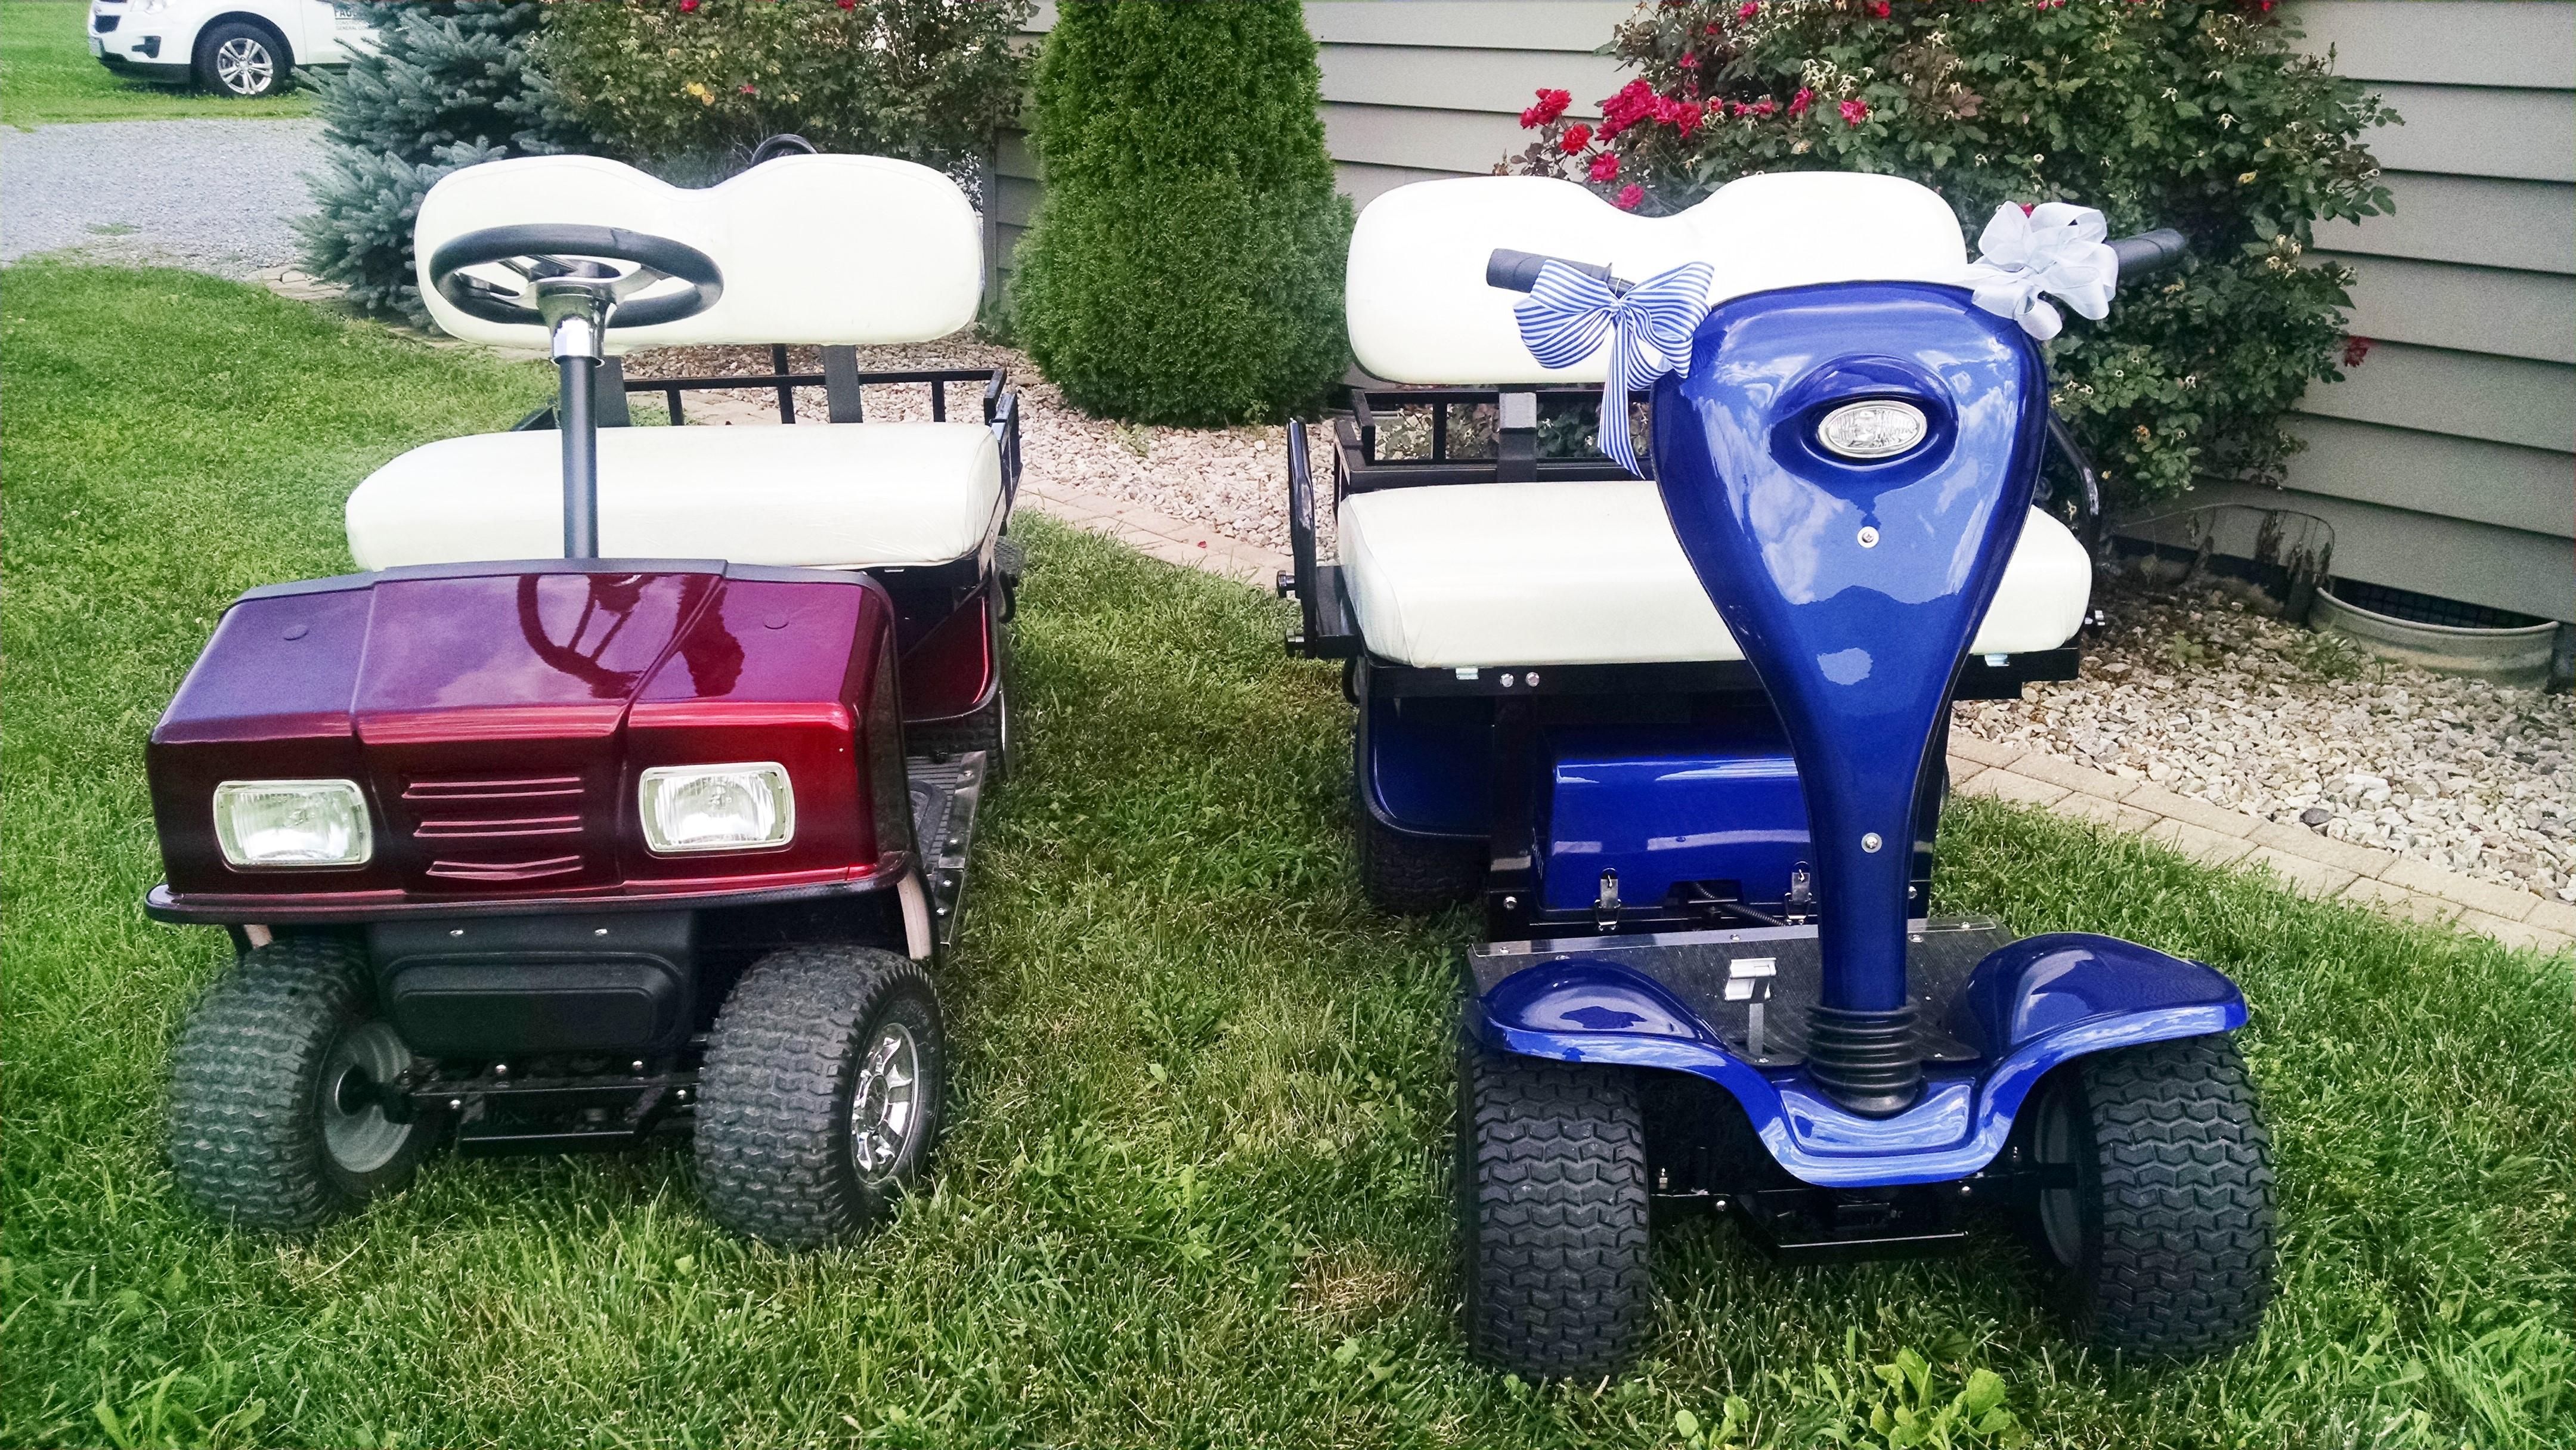 For Sale - CRICKET - HORSE EVENT MINI ELECTRIC CART Golf Cart Gauge Cket on golf cart electronics, golf cart lamps, golf cart lights, golf cart cooling system, golf cart labels, golf cart gears, golf cart hoods, golf cart fuel, golf cart start up, golf cart brushes, golf cart regulator, golf cart exterior, golf cart wiring, golf cart tubing, golf cart actuators, golf cart switches, golf cart relays, golf cart clip art, golf cart product, golf cart cleaning,